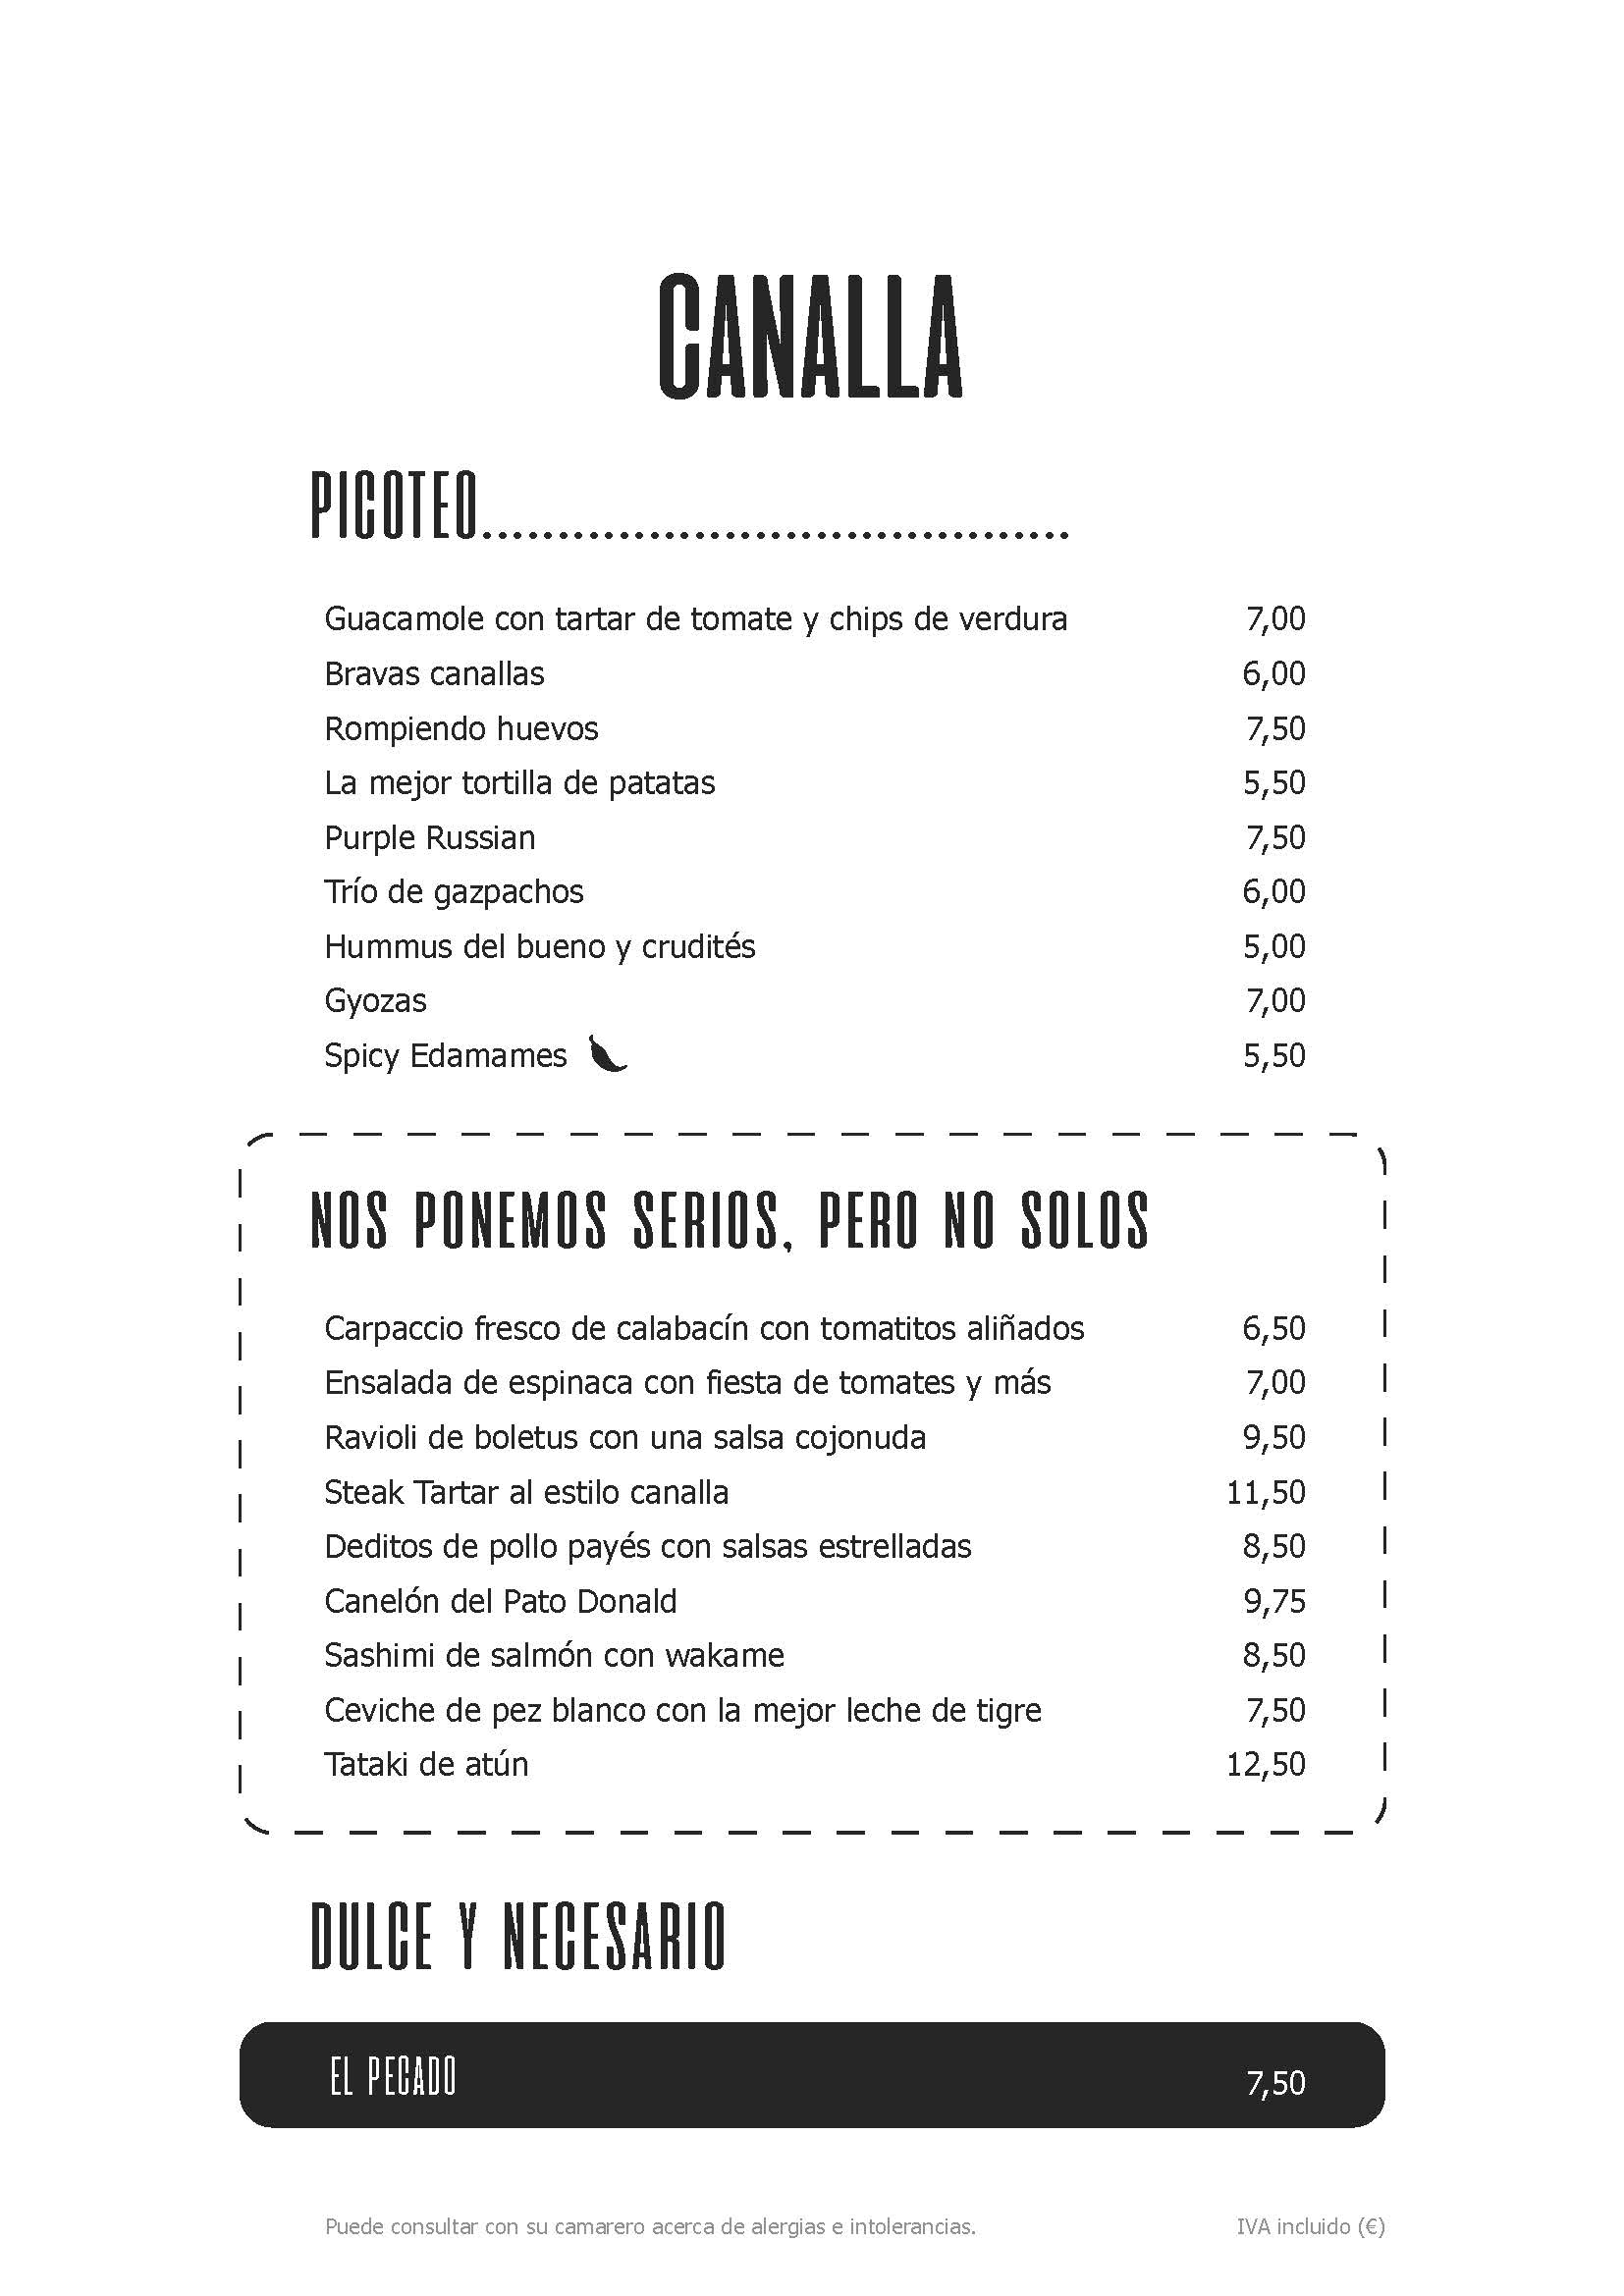 carta-canalla-OK_Página_1.jpg